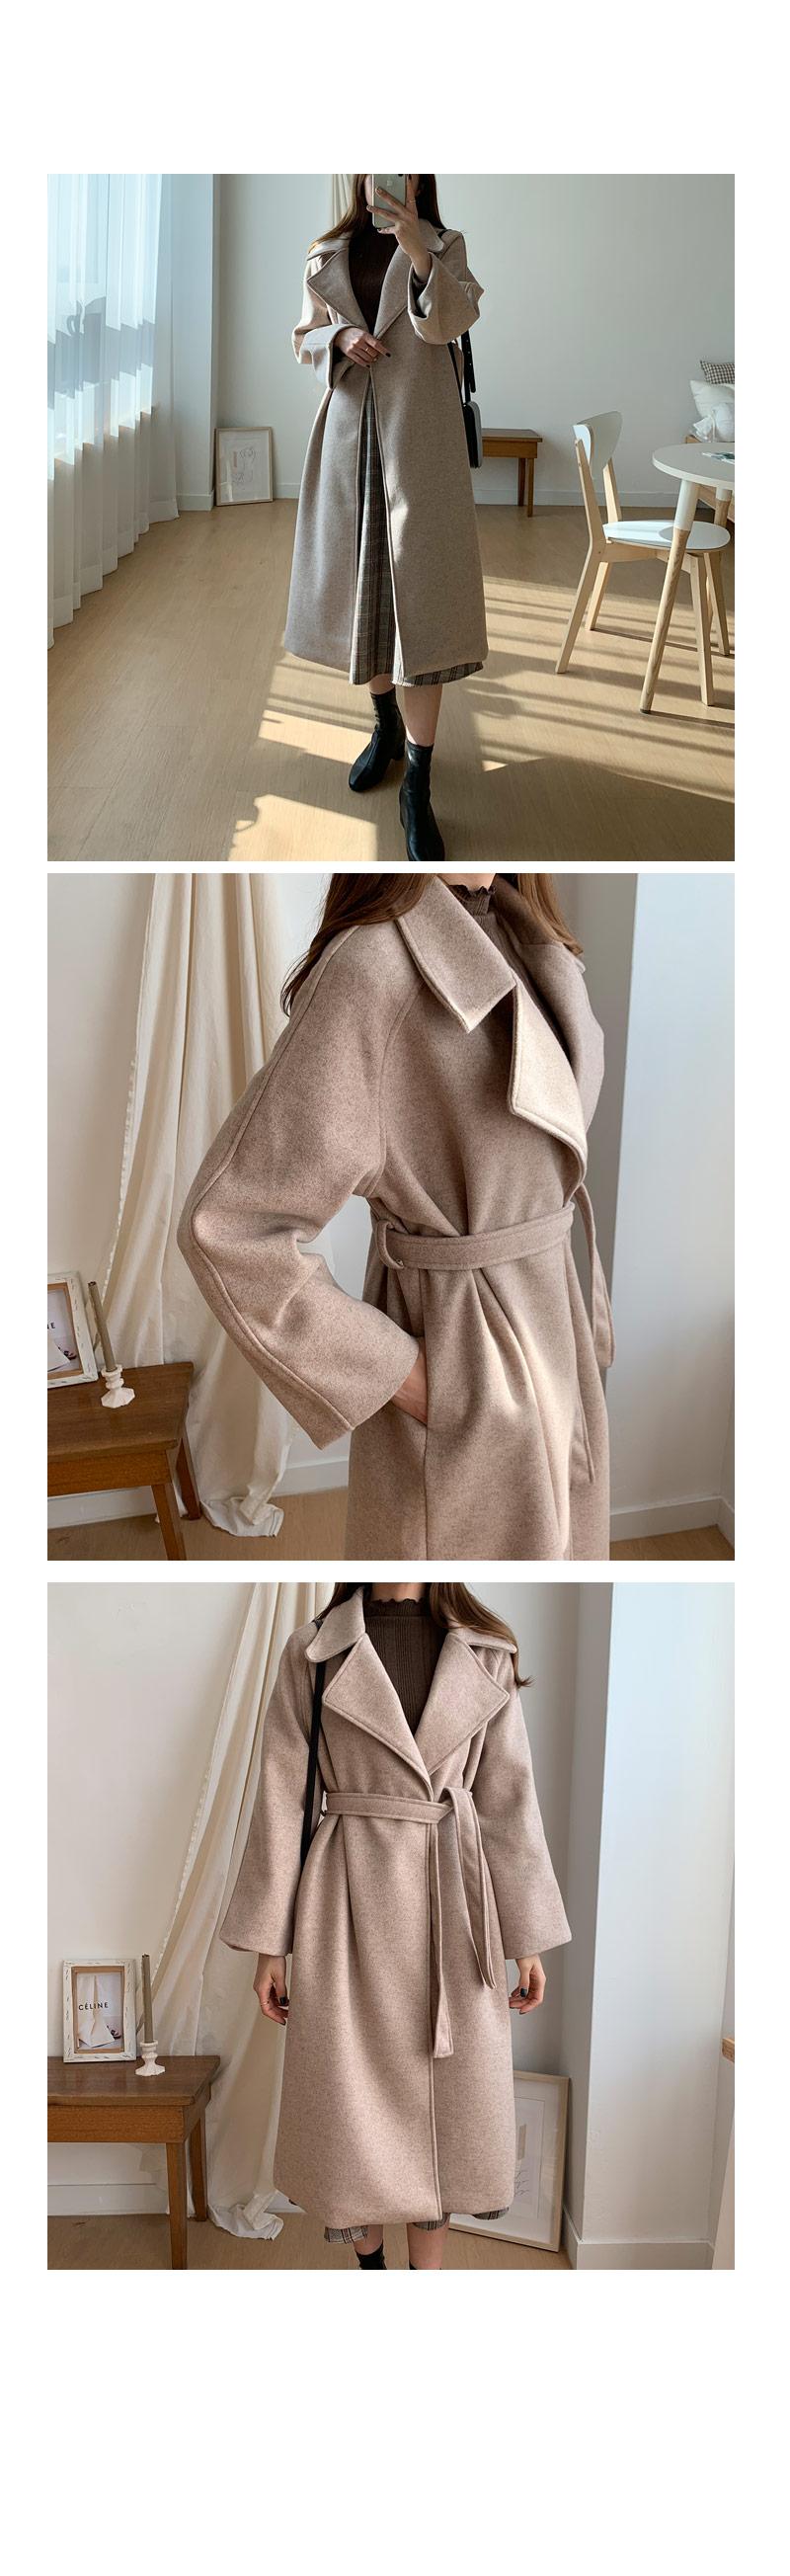 Palave strap boca wool coat